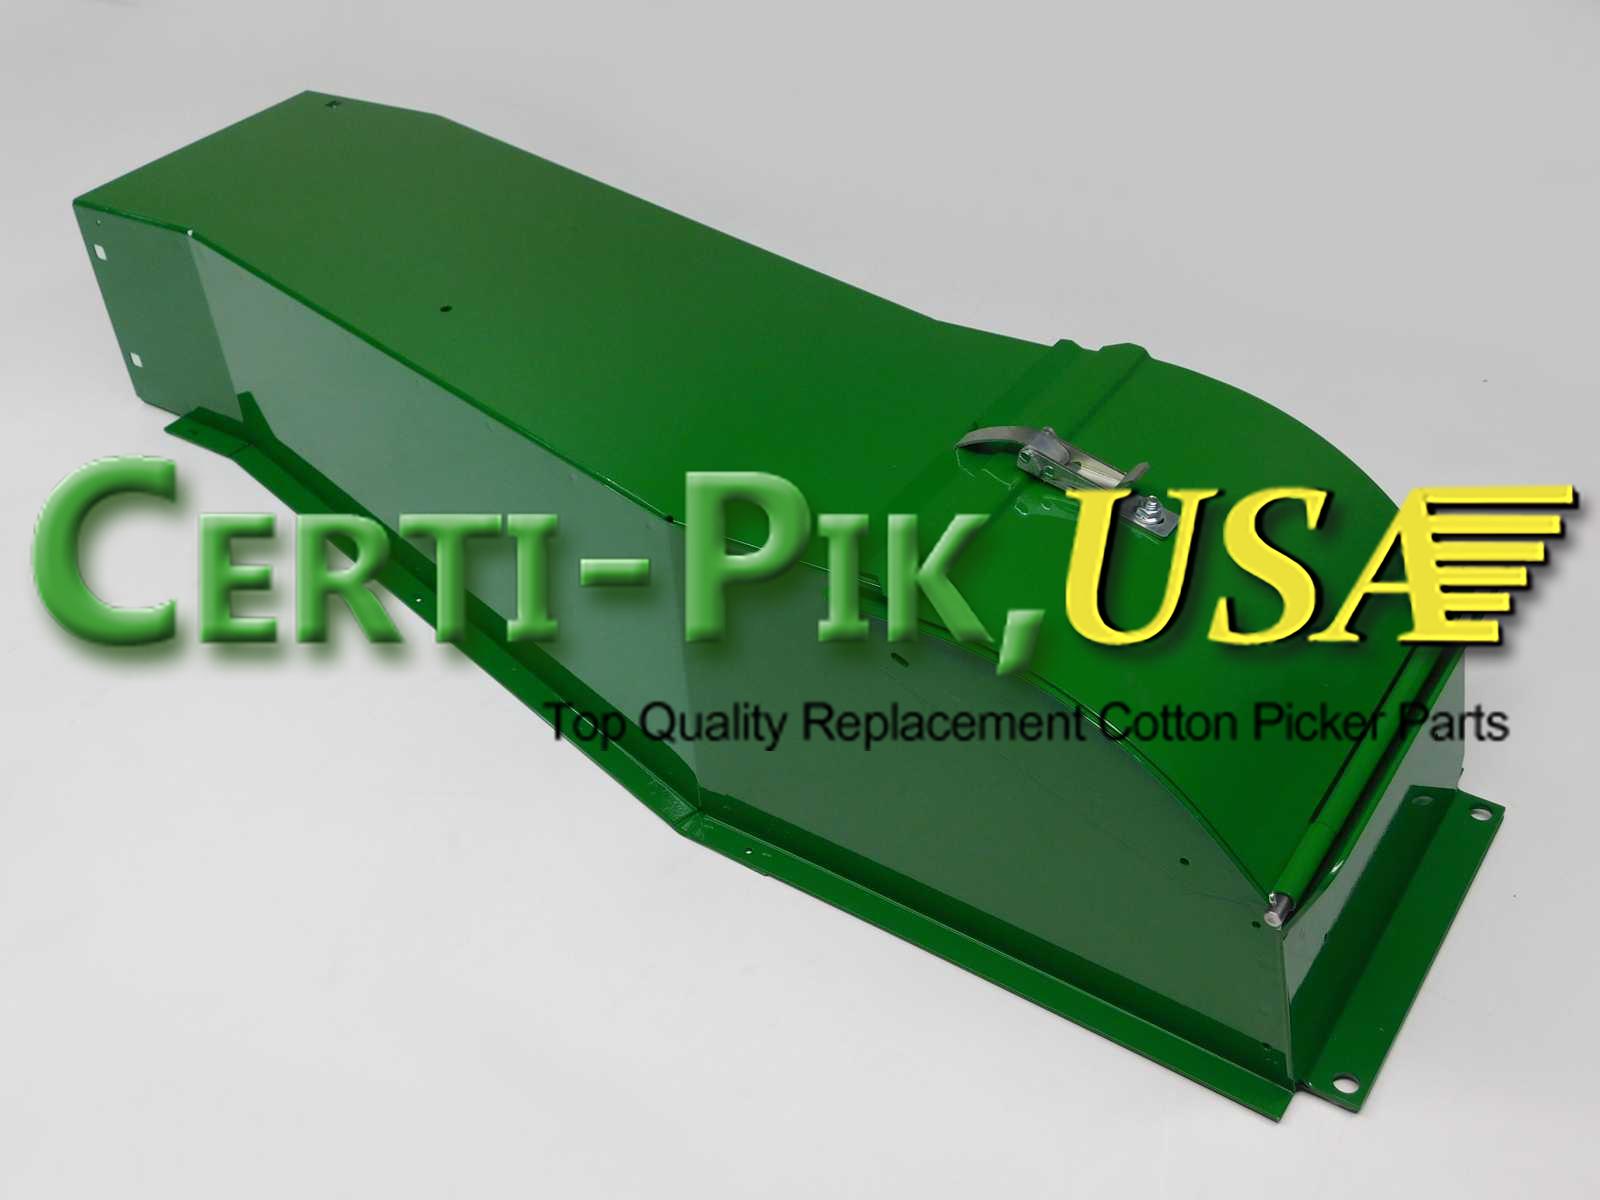 Air System: John Deere 9935-CP690 Pro Suction Door Parts